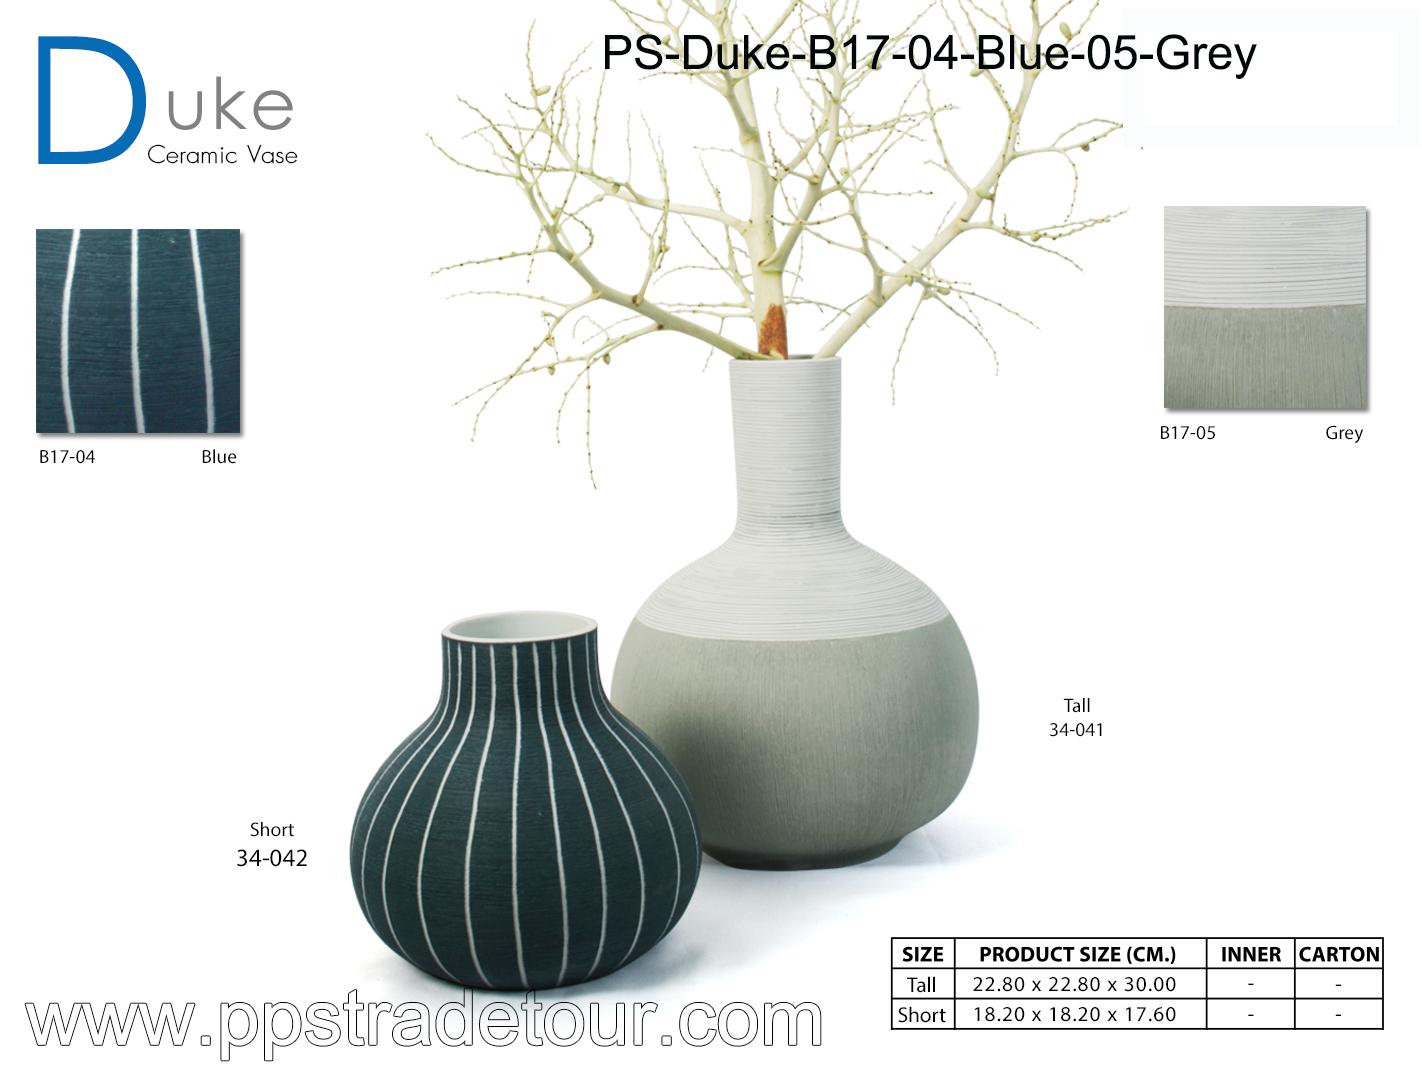 PSCV-Duke-B17-04-Blue-05-Grey